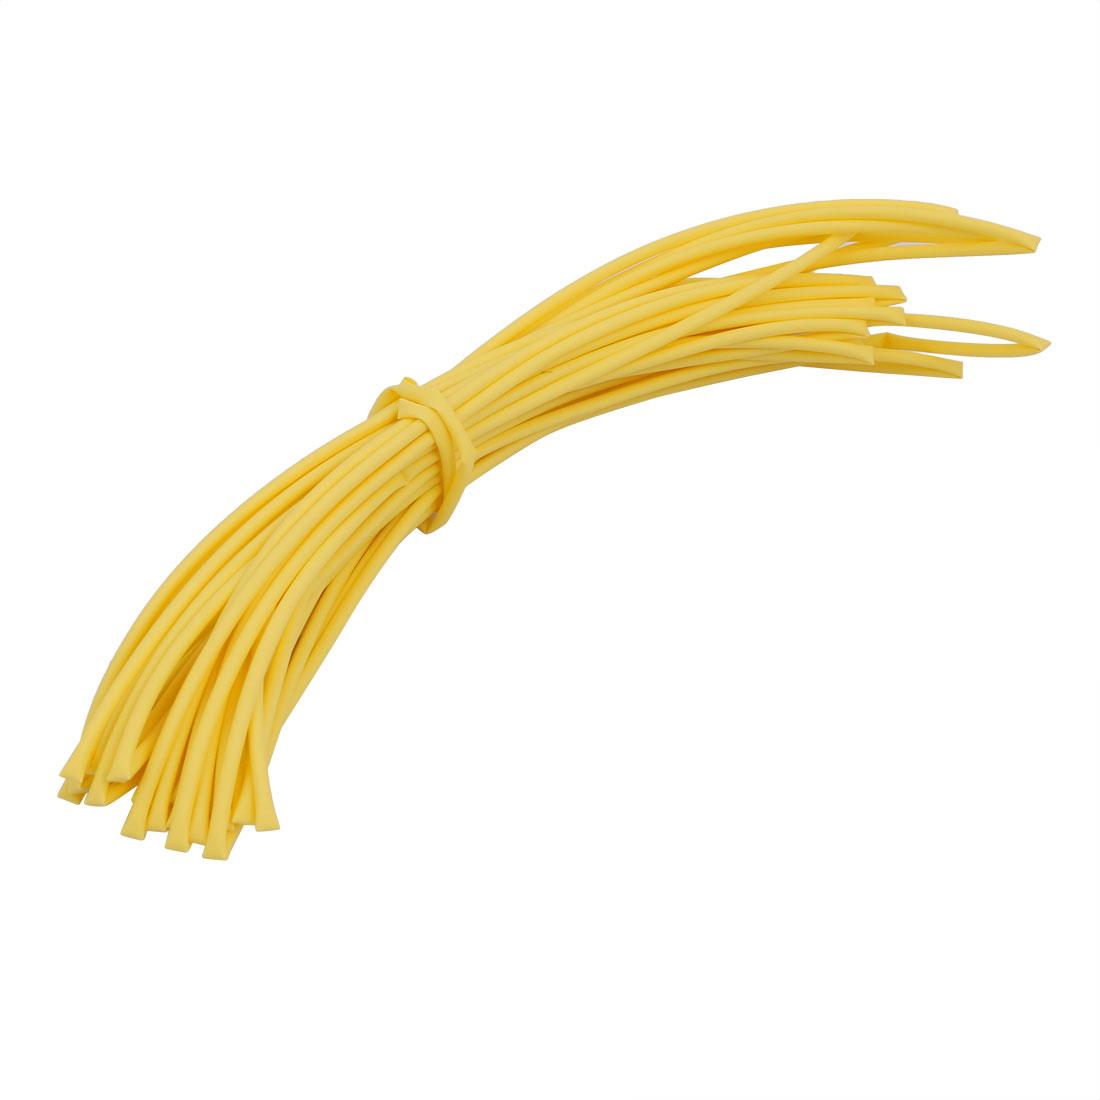 8M 0.06in Inner Dia Polyolefin Flame Retardant Tube Yellow for Wire Repairing